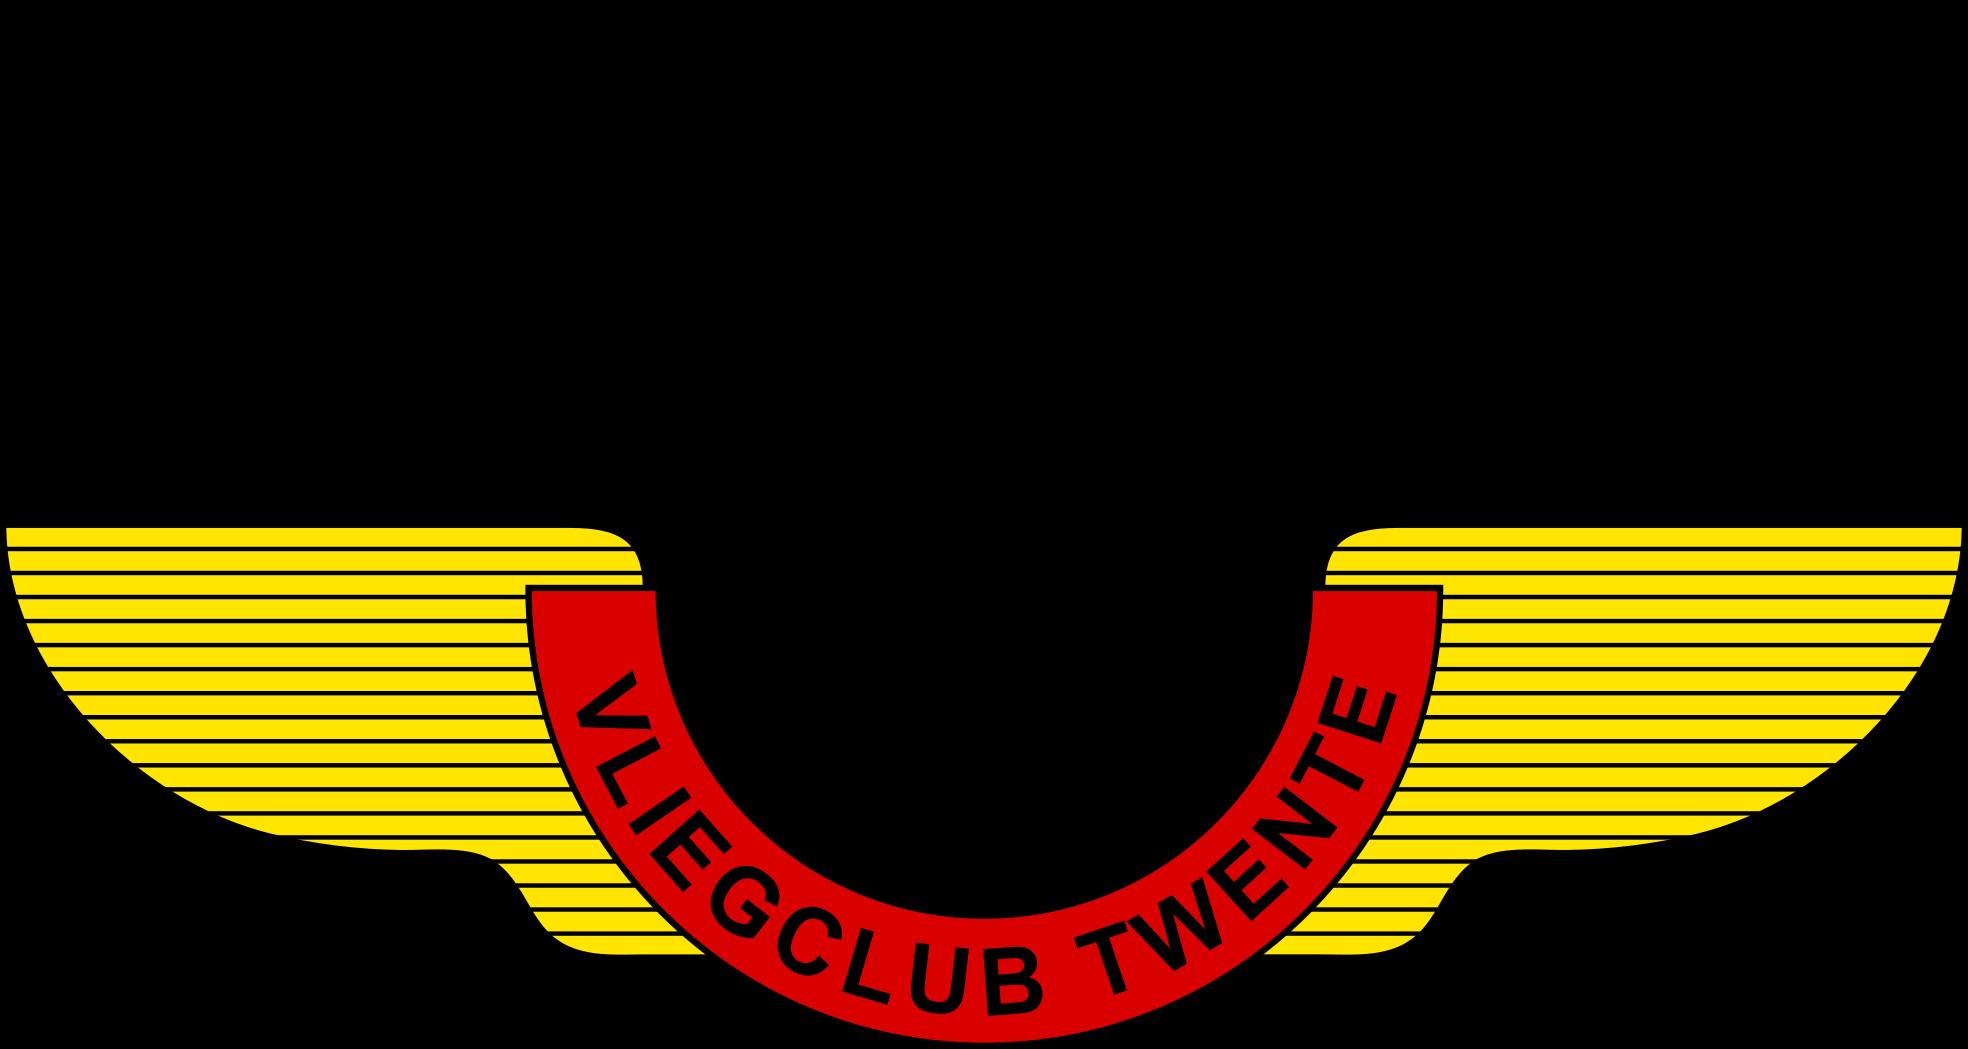 Vliegclub Twente